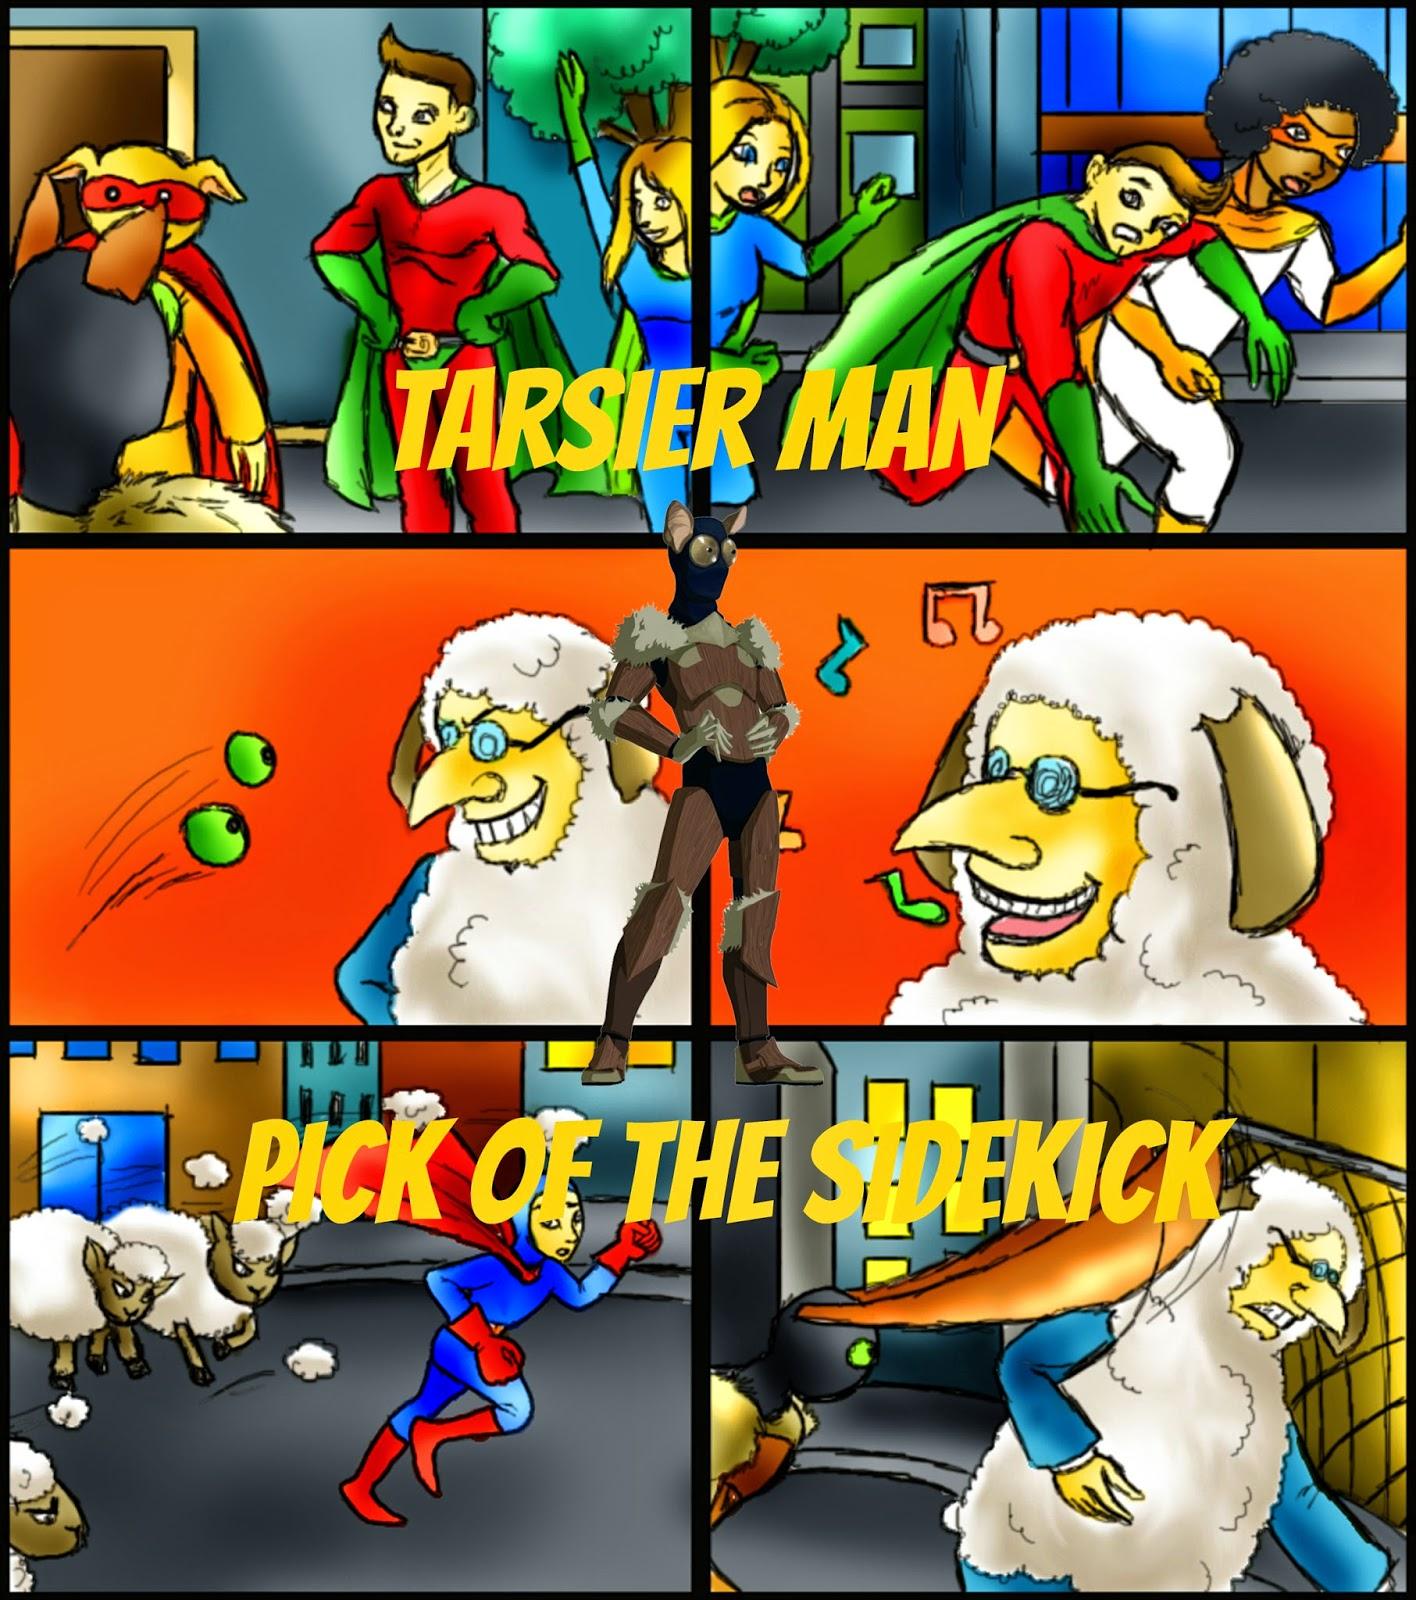 http://www.amazon.com/Tarsier-Man-Sidekick-Pat-Hatt-ebook/dp/B00UG8TCRS